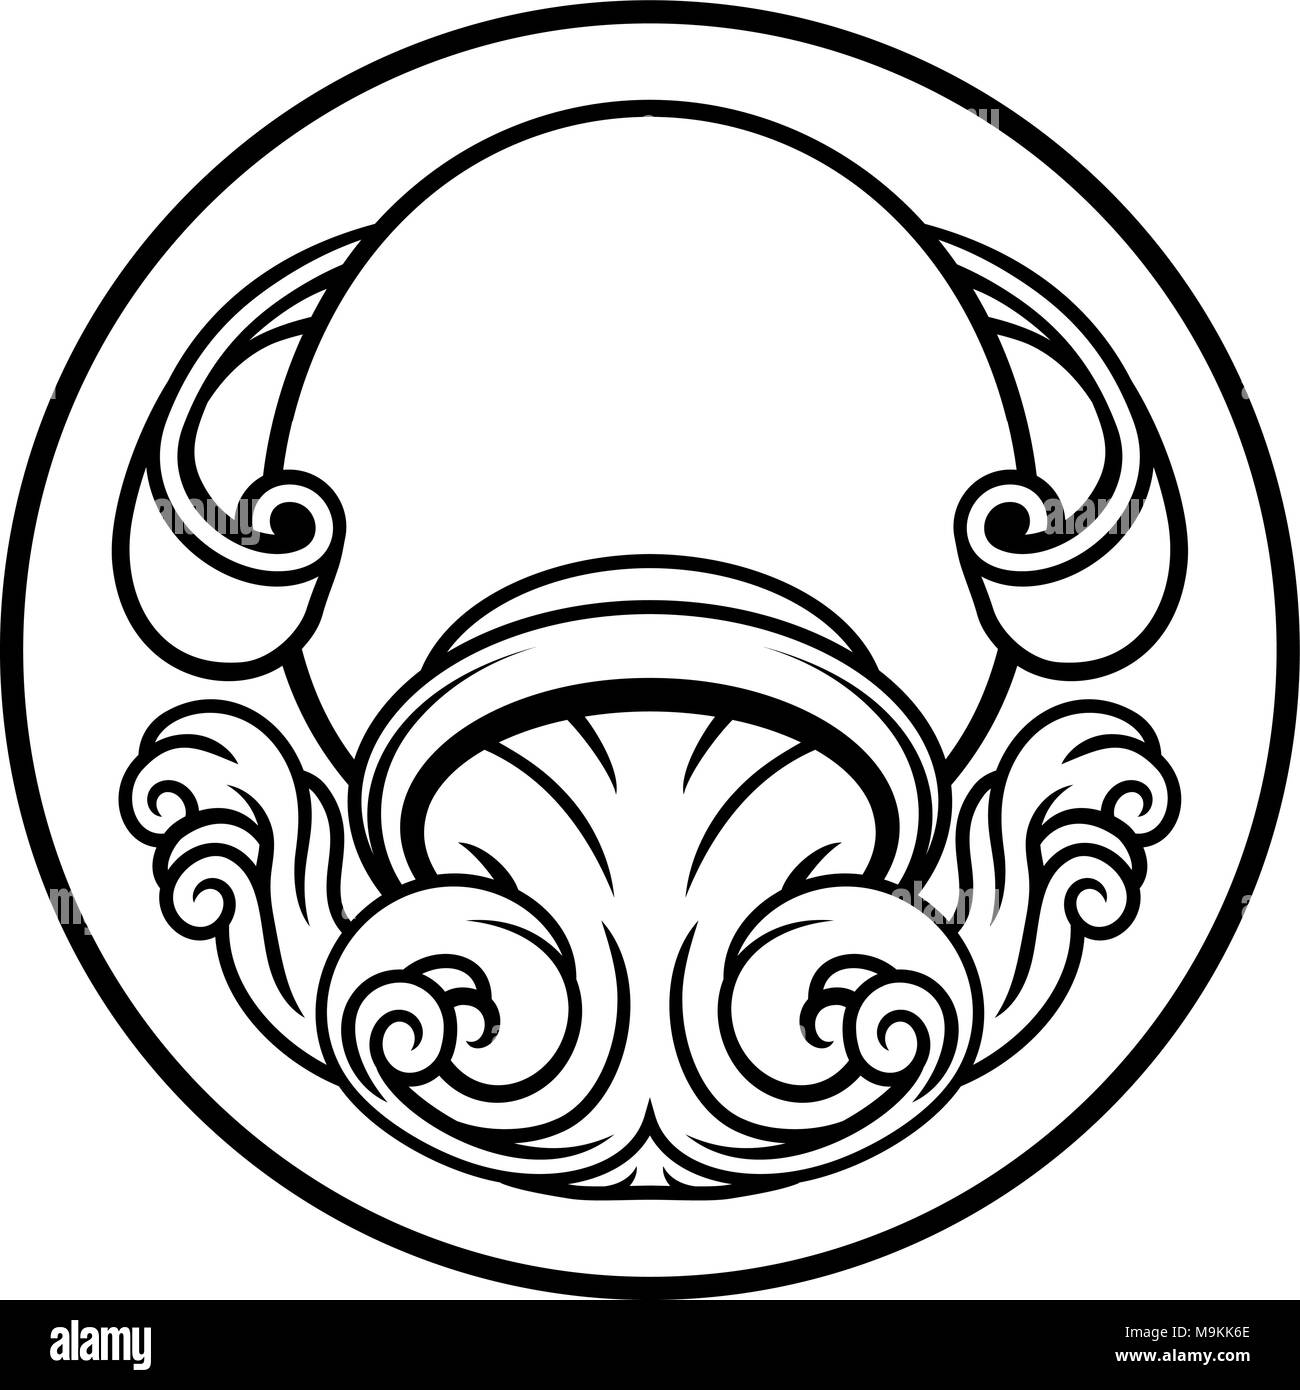 Aquarius horoscope astrology king